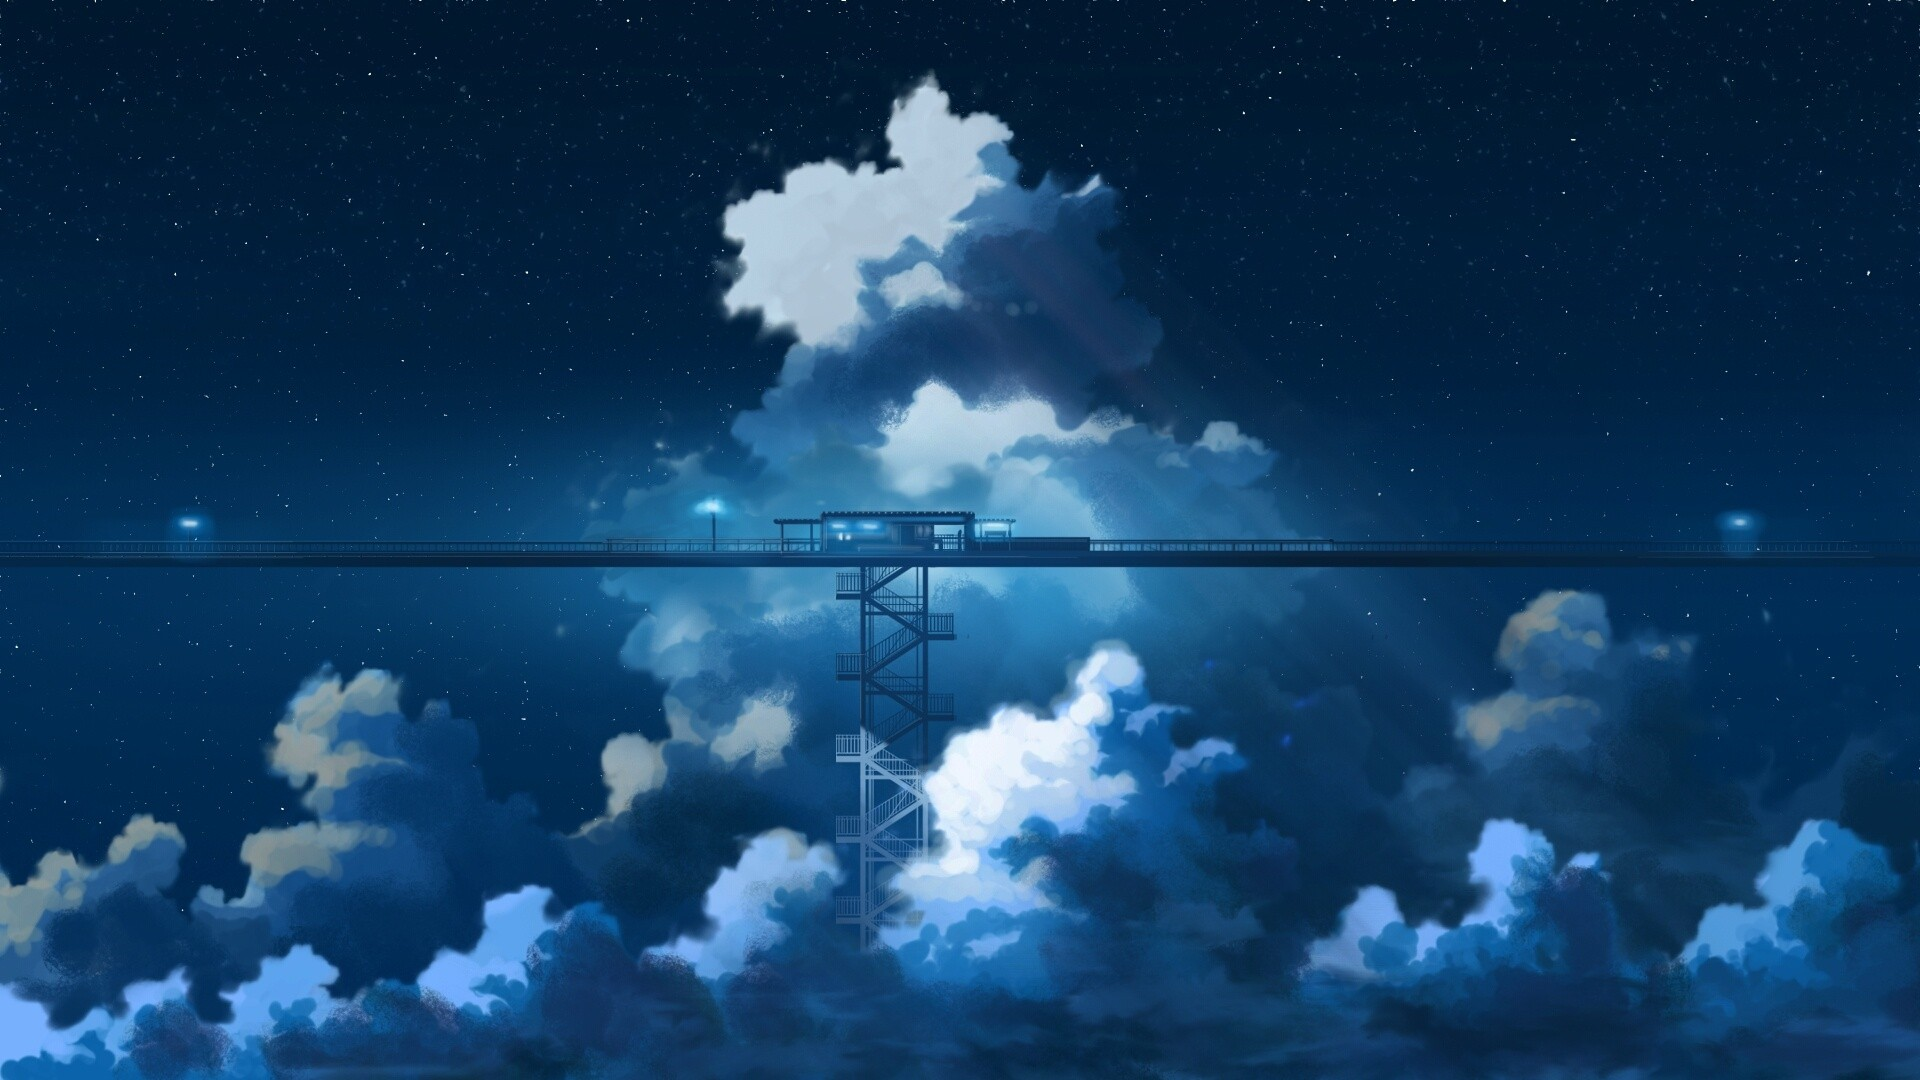 Anime Clouds Image